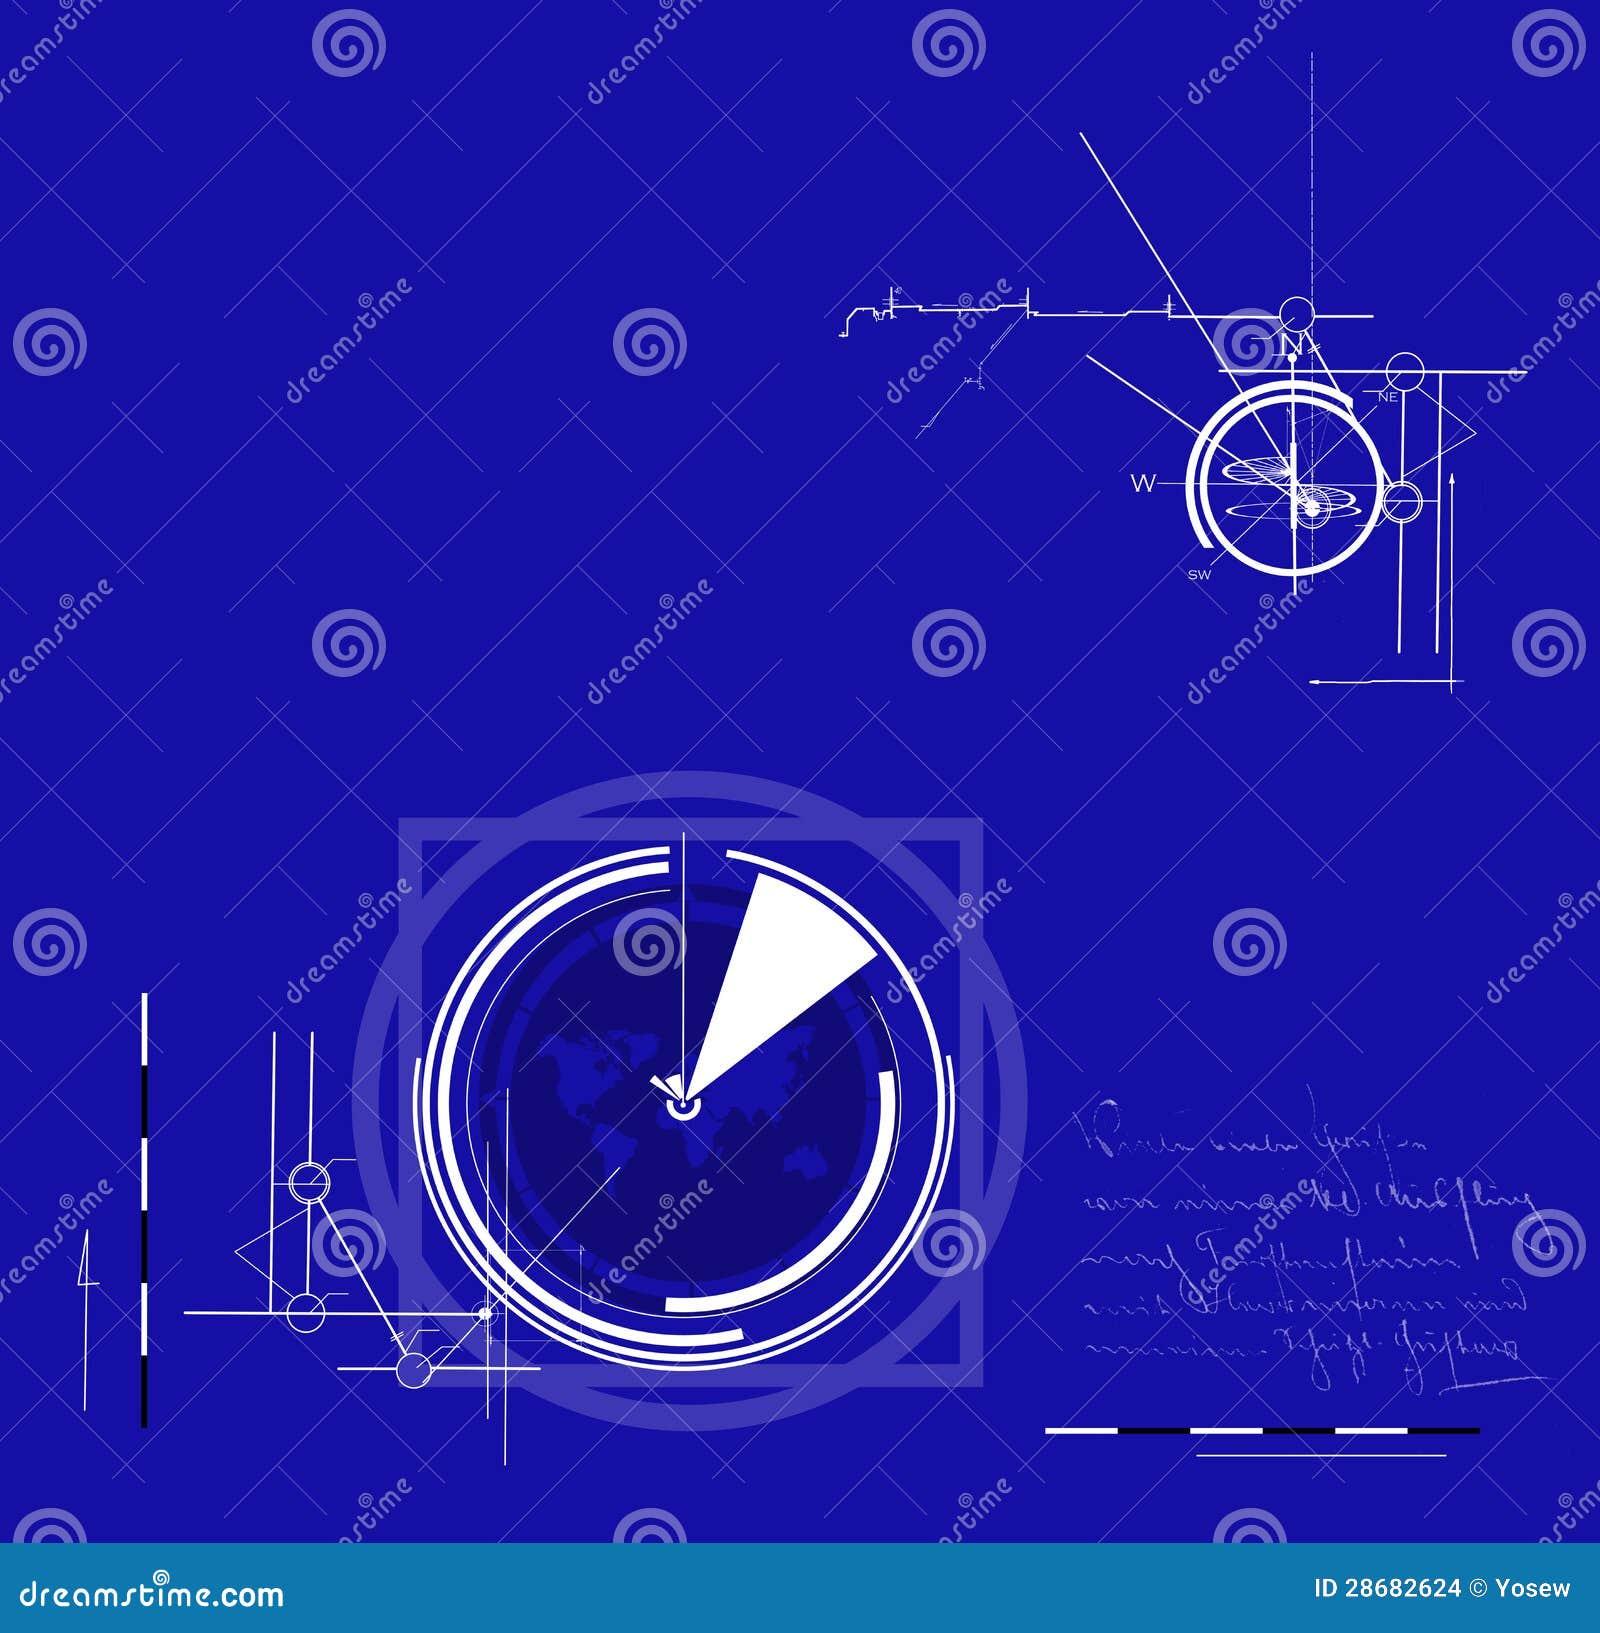 Technical Background Stock Illustration  Illustration Of